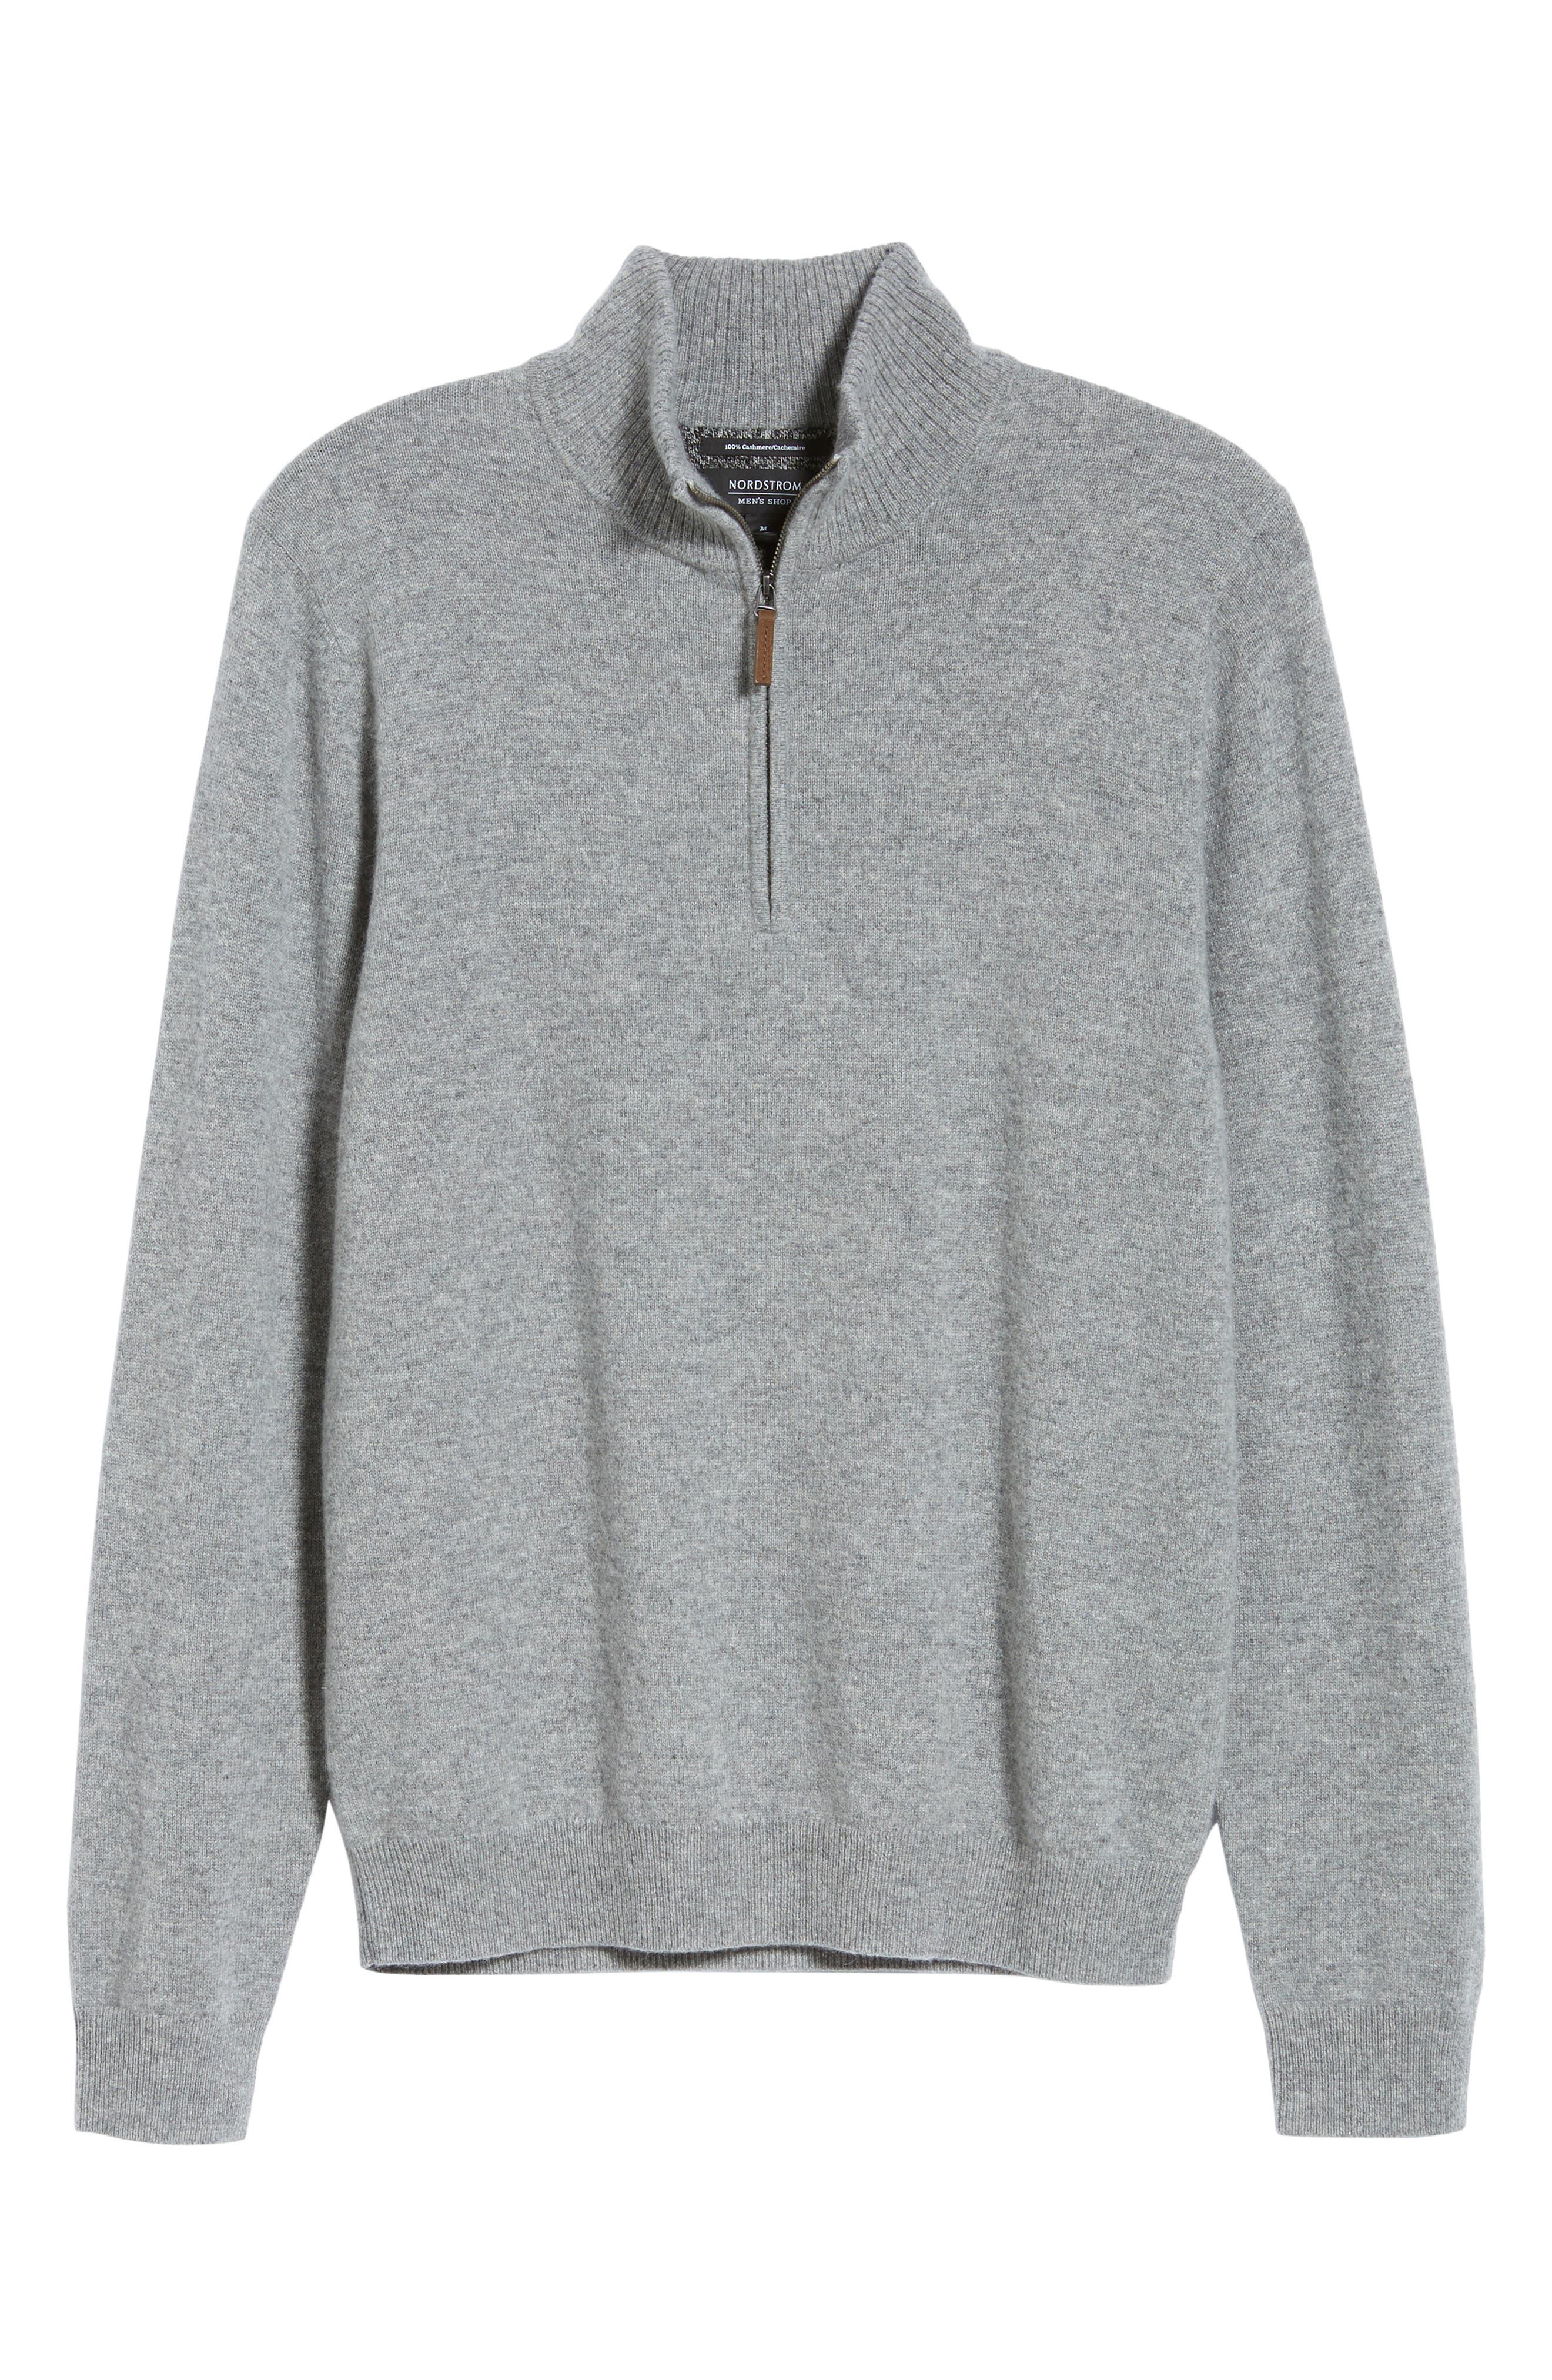 Regular Fit Cashmere Quarter Zip Pullover,                             Alternate thumbnail 6, color,                             GREY DRIFTWOOD